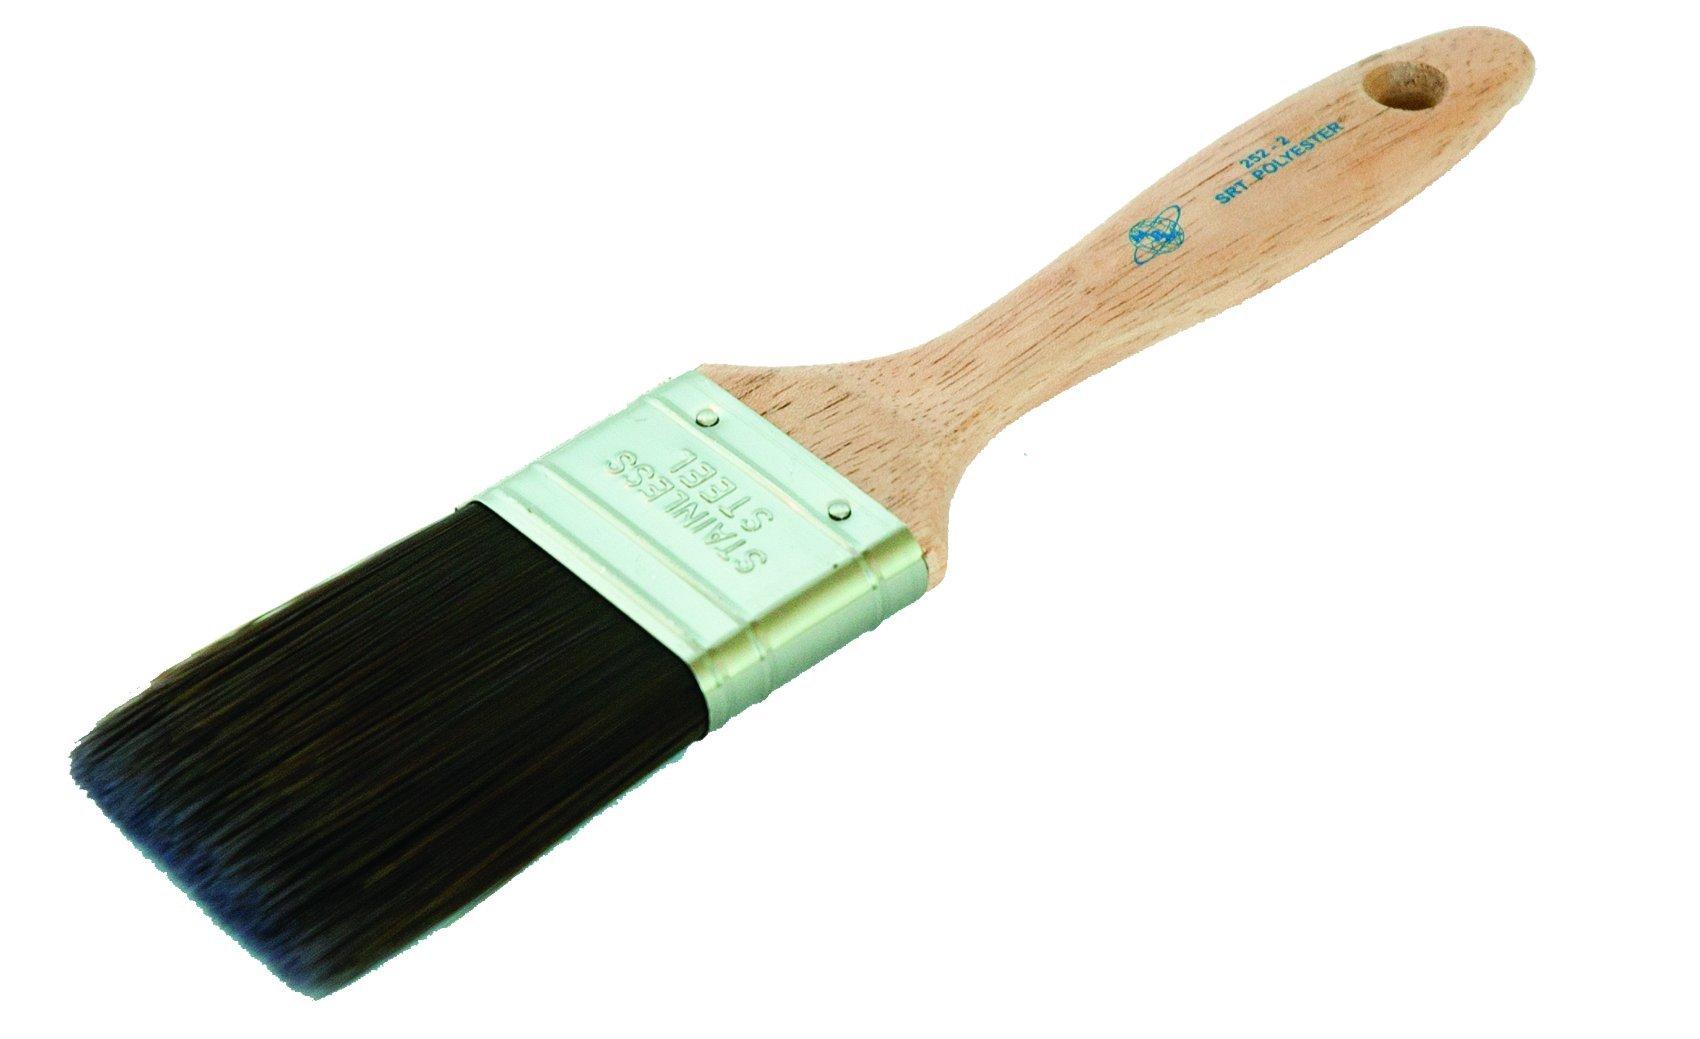 Magnolia Brush 252-2.5 SRT Professional Beavertail Paint Brush, Polyester Bristles, 2-1/2'' Bristle Width (Case of 12)